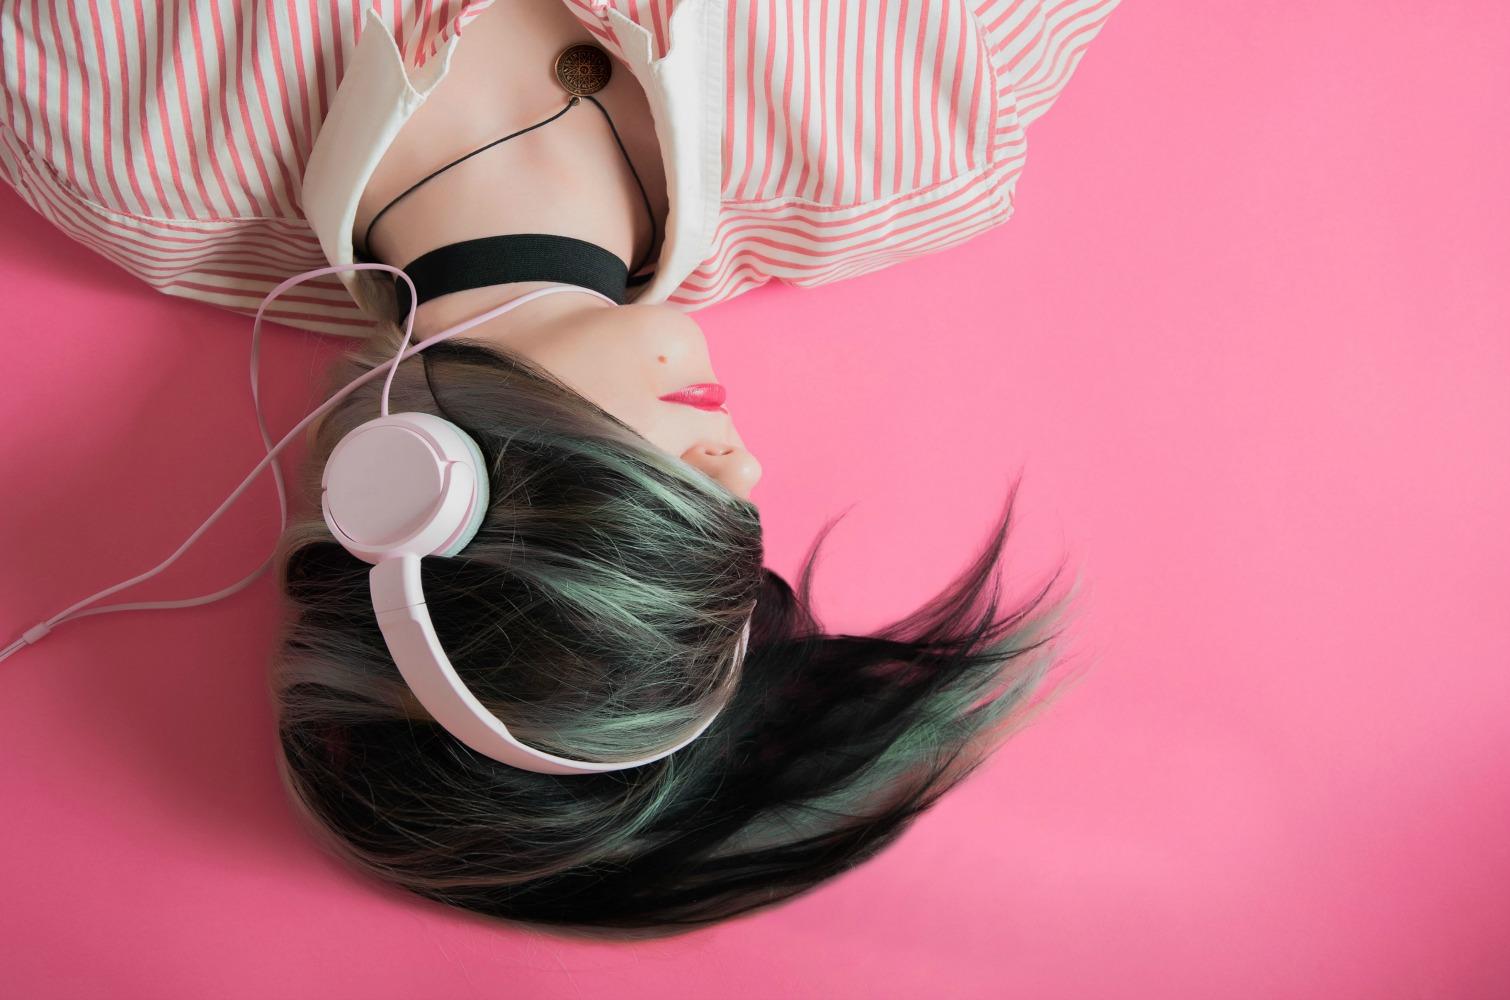 MUSIC PLAYLIST -